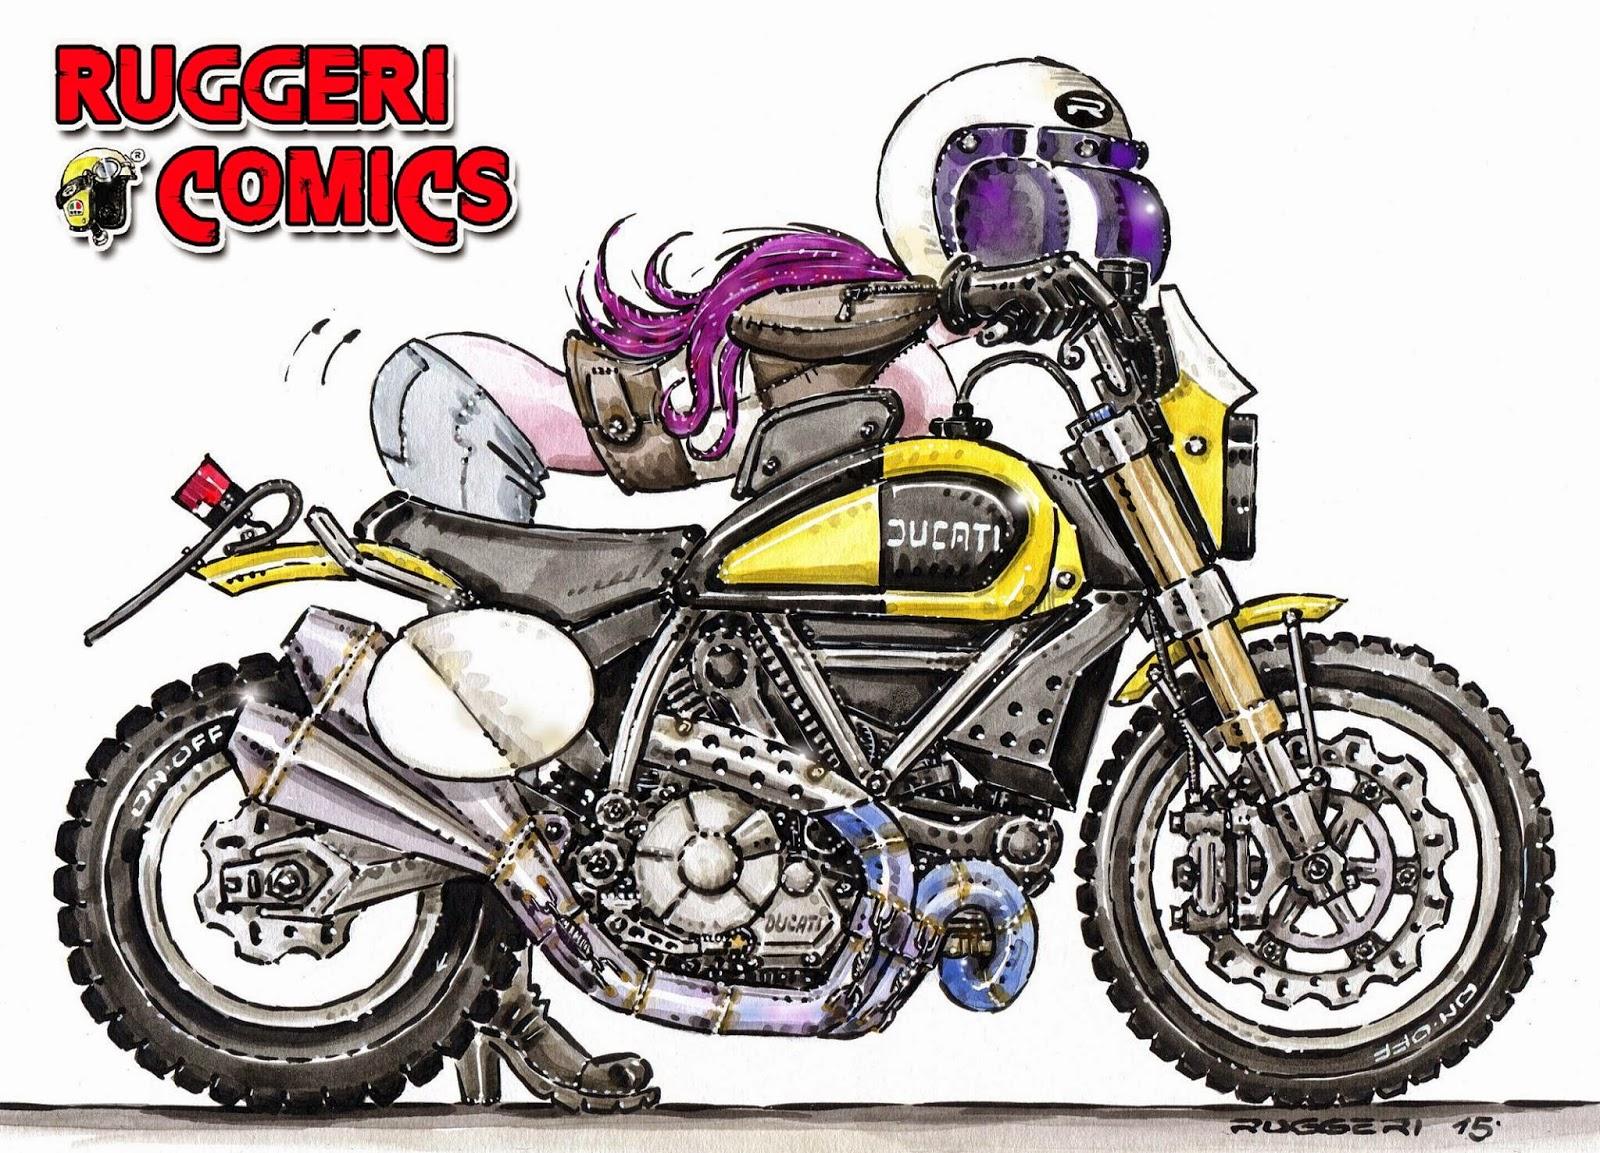 Racing Caf U00e8  Ruggeri U0026 39 S Comics  44